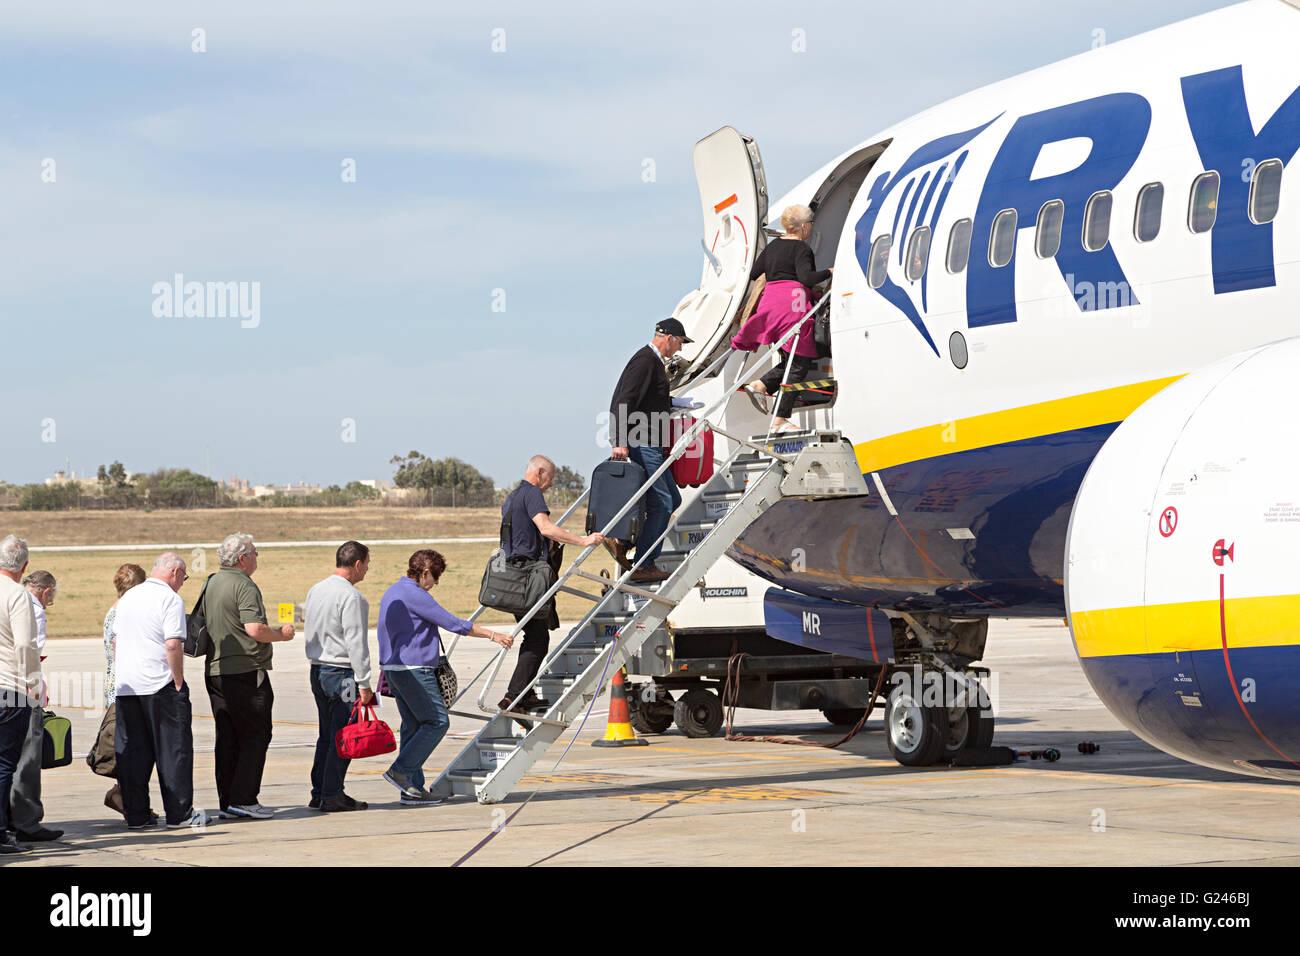 Passengers boarding a Ryanair flight, Malta - Stock Image